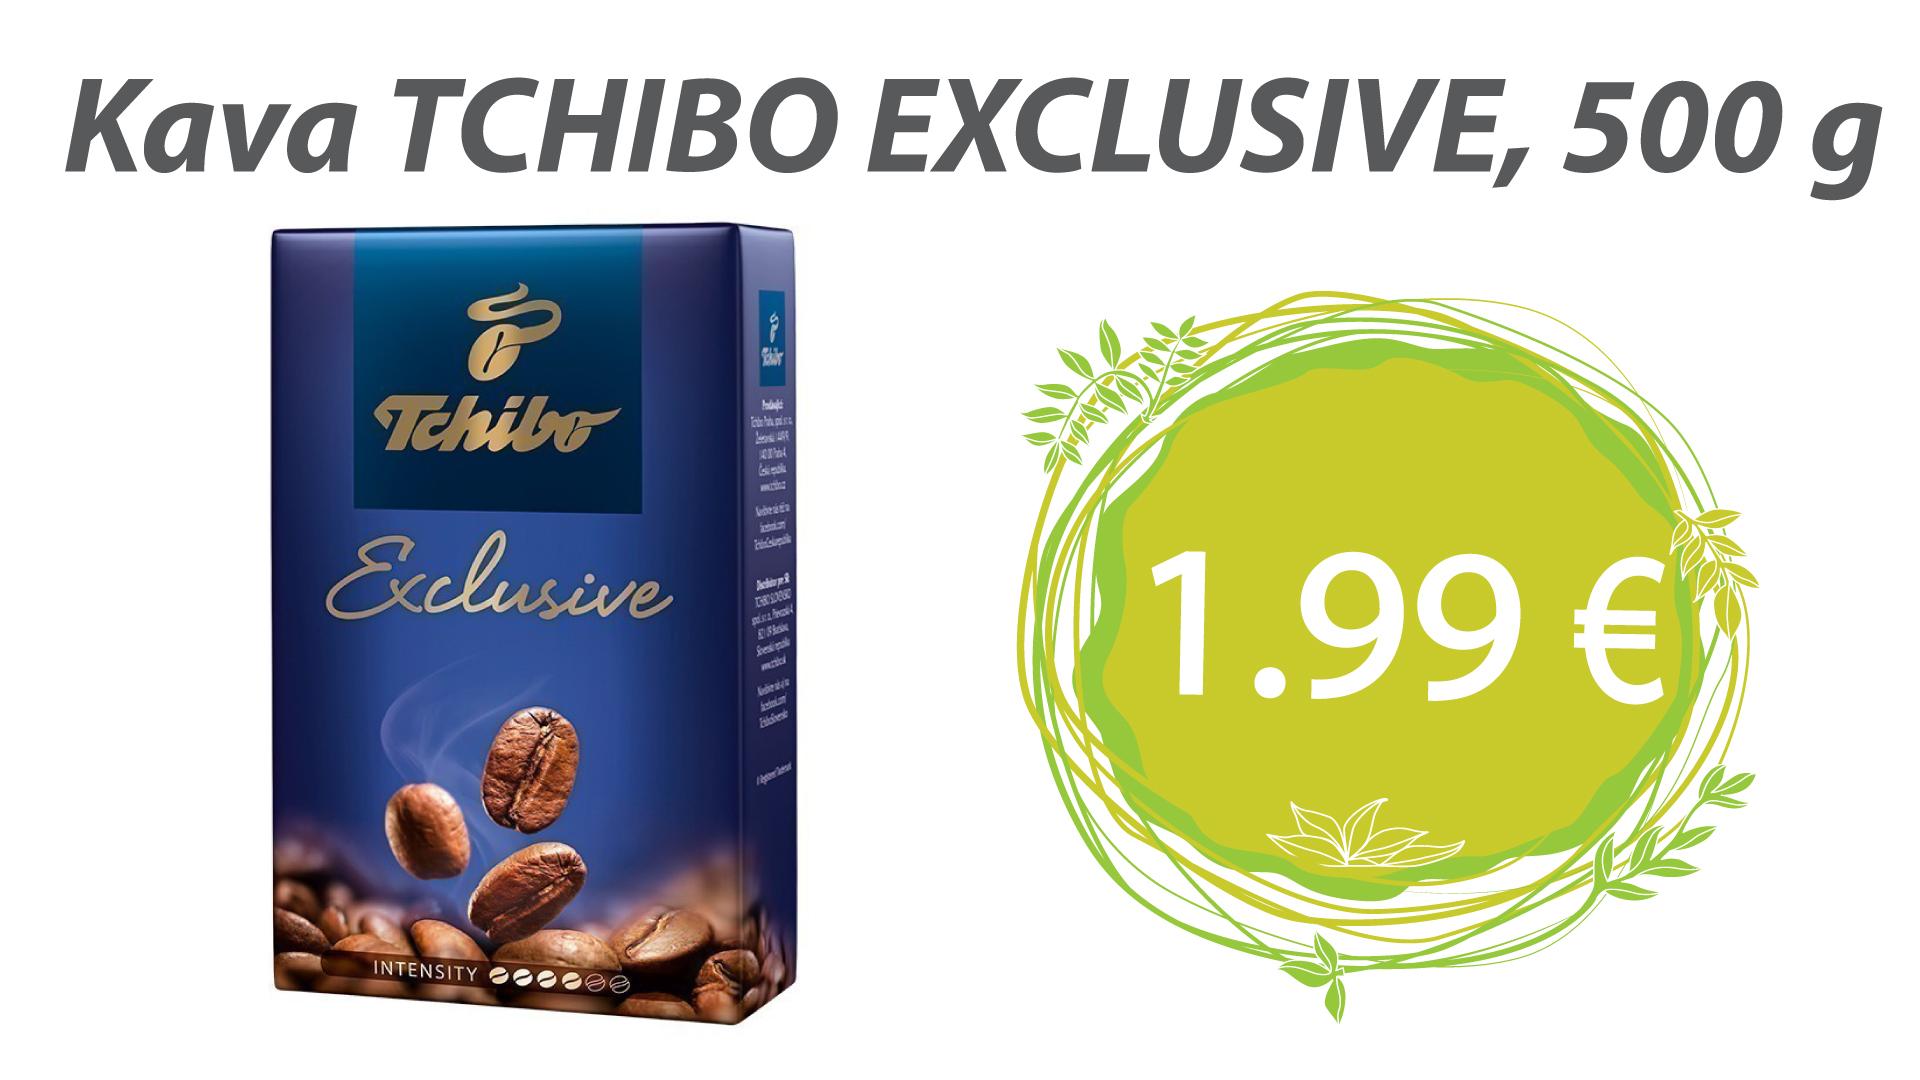 kava-tchibo-exclusive